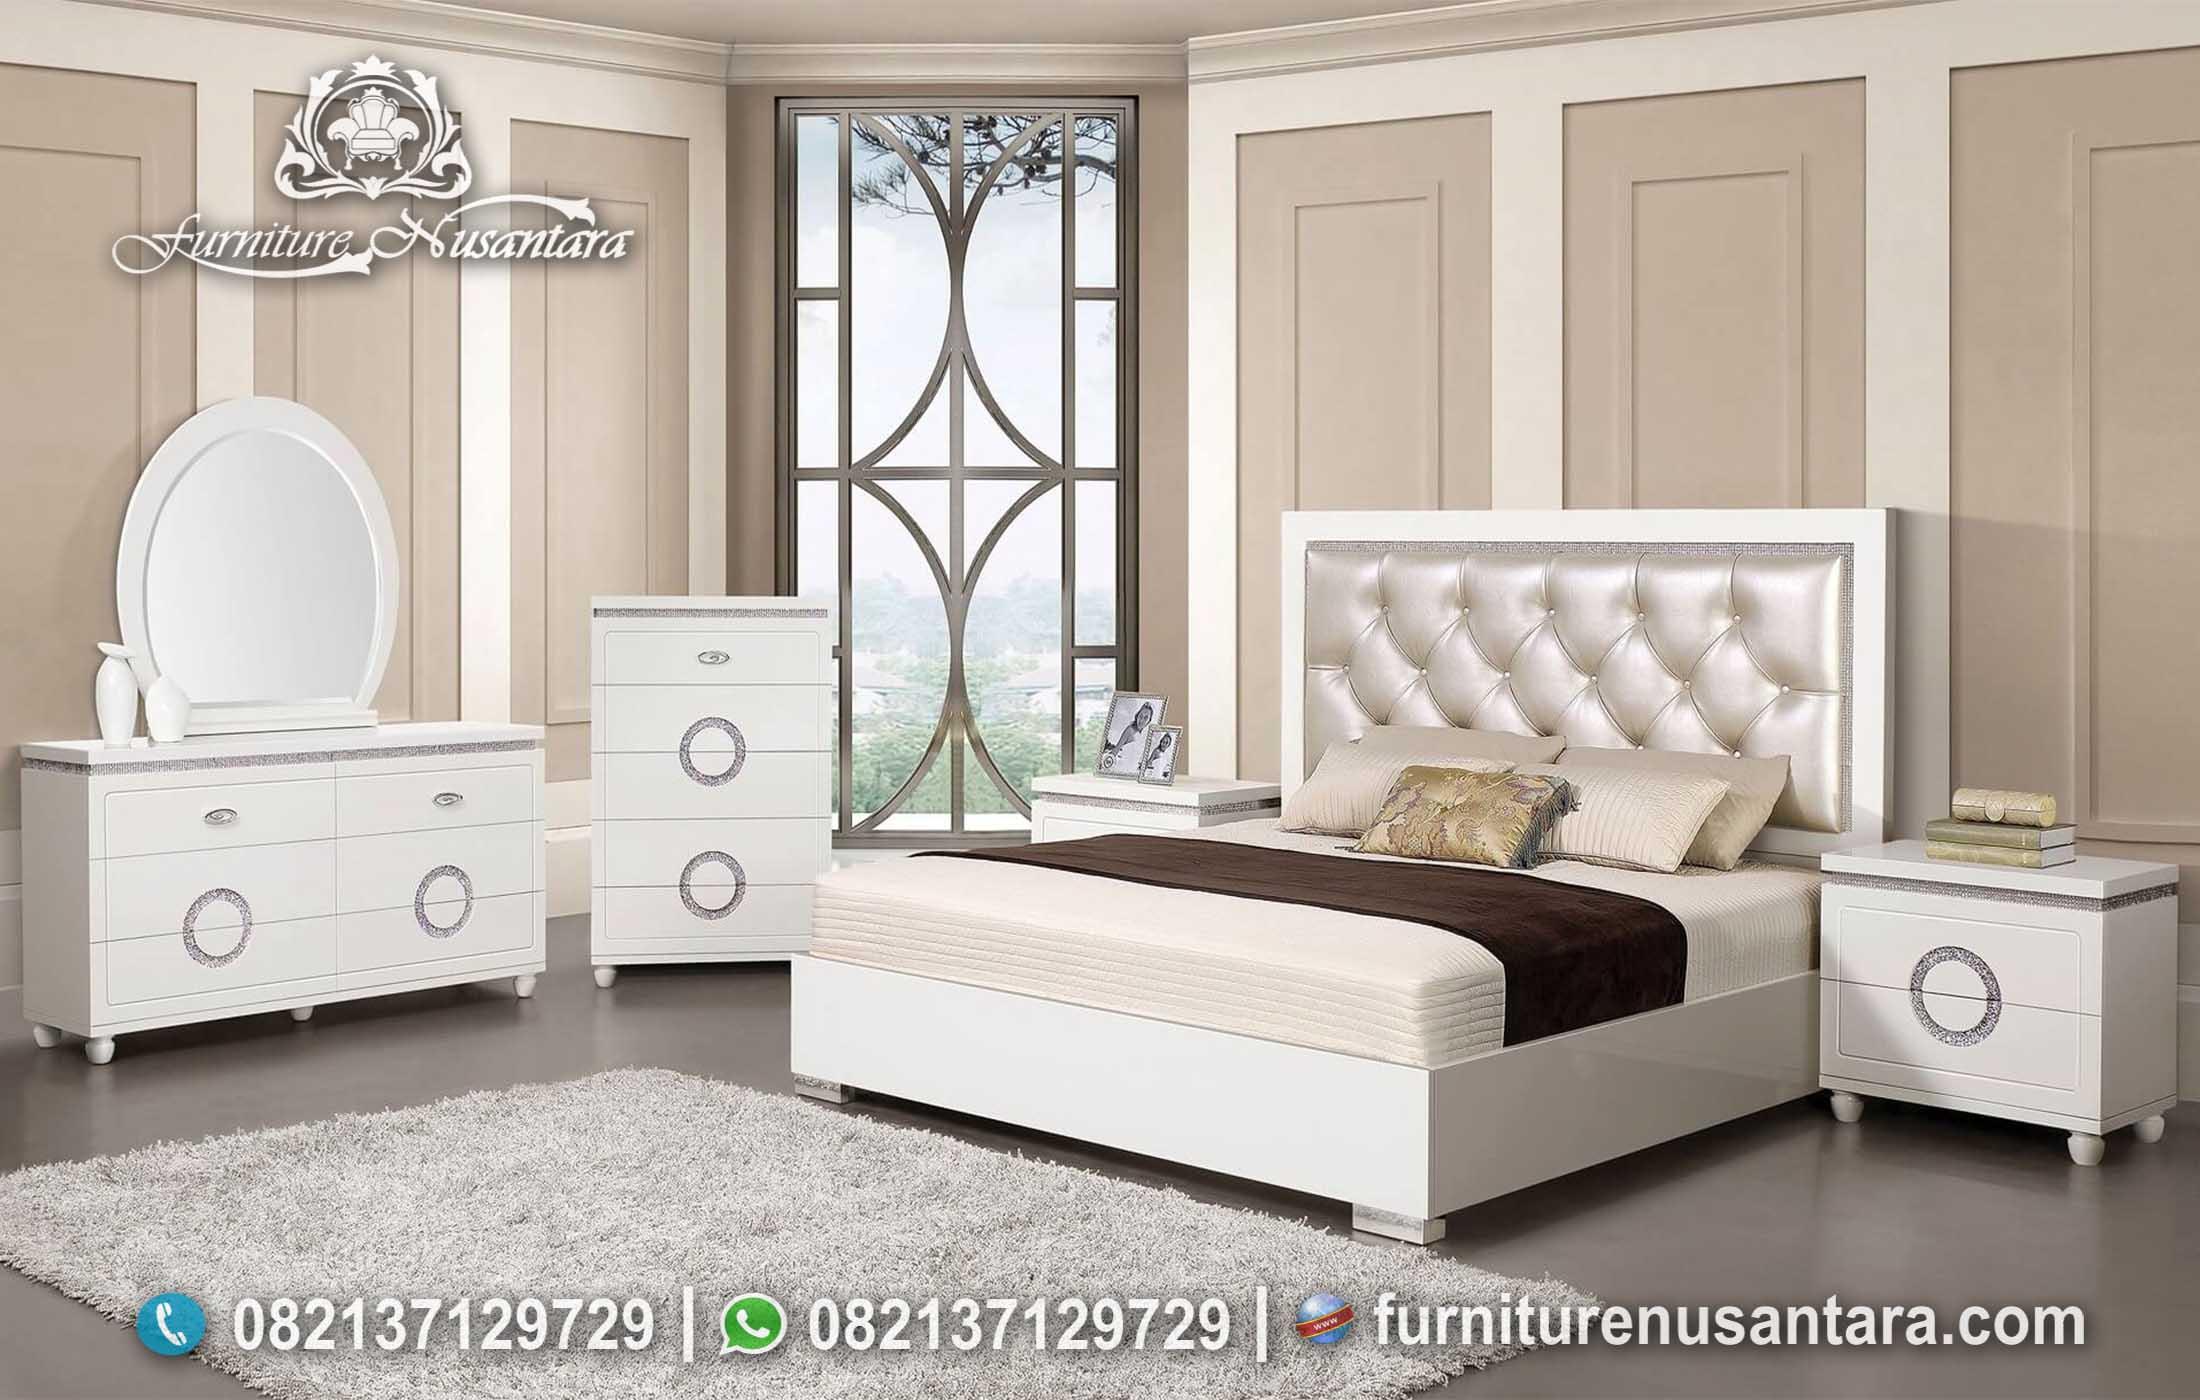 Desain Kamar Minimalis Bergaya Korea KS-169, Furniture Nusantara